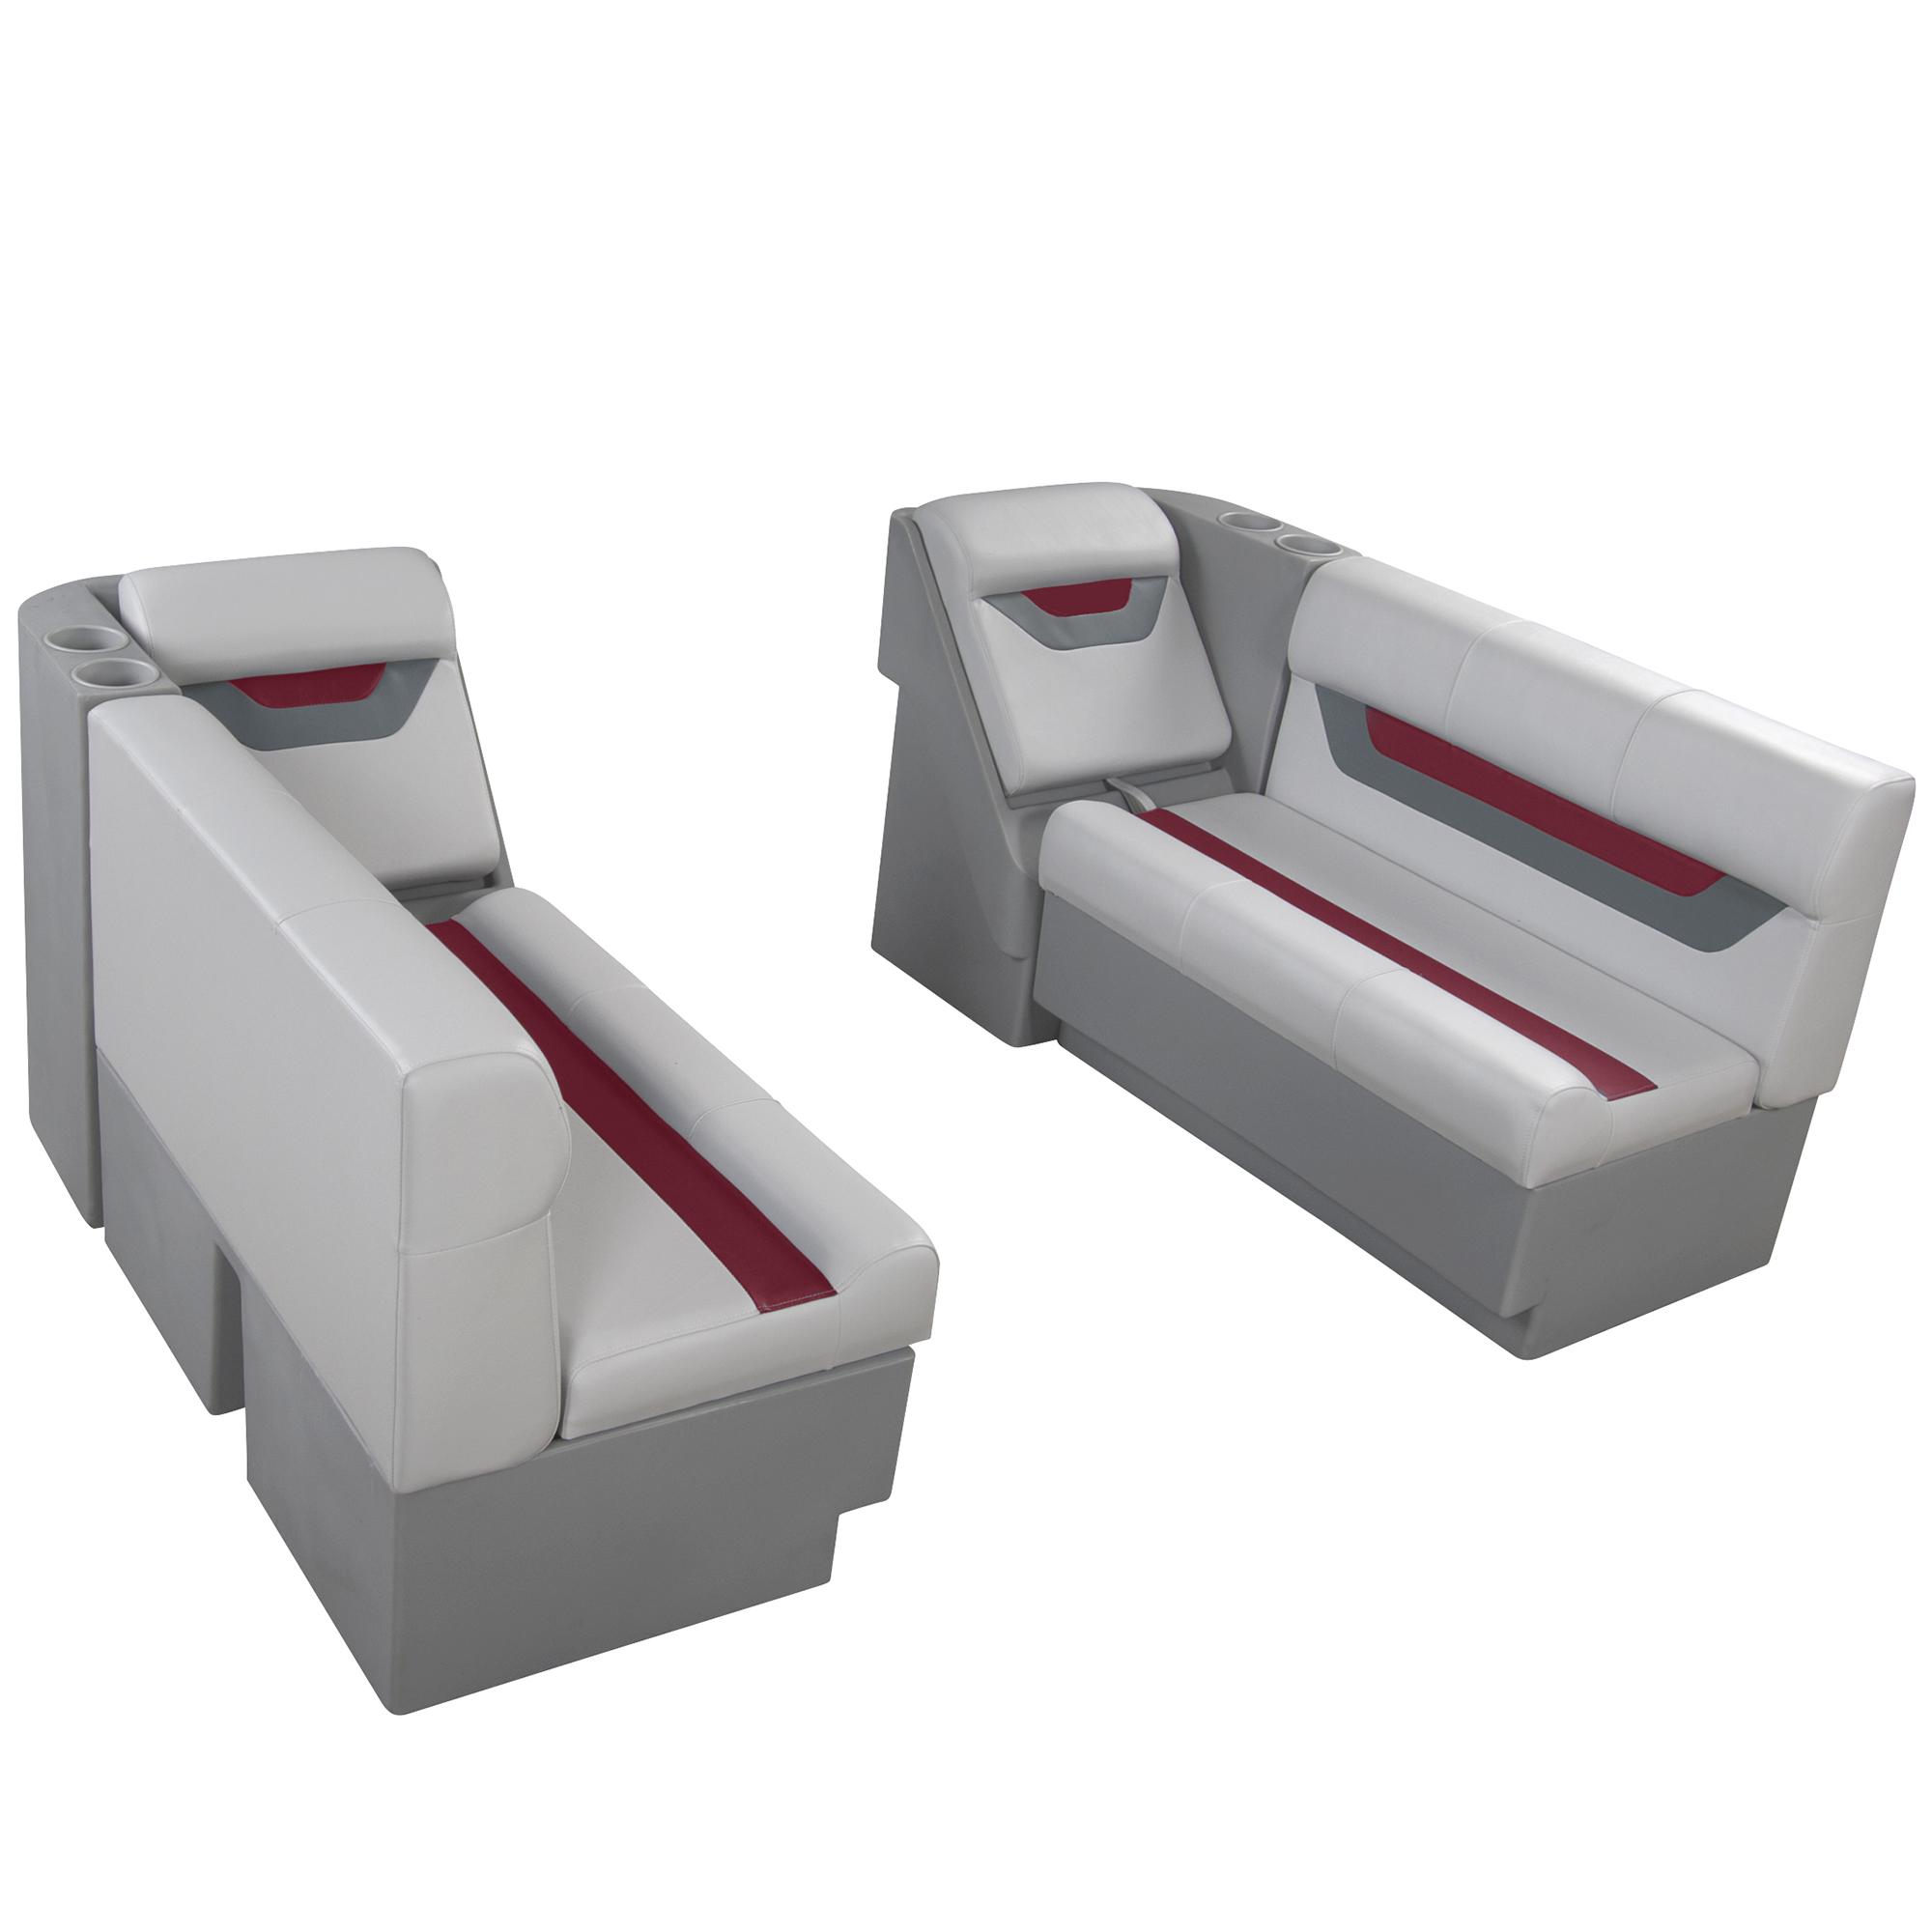 "Designer Pontoon Furniture - 54"" Front Lounge Package, Sky Gray/Dark Red"